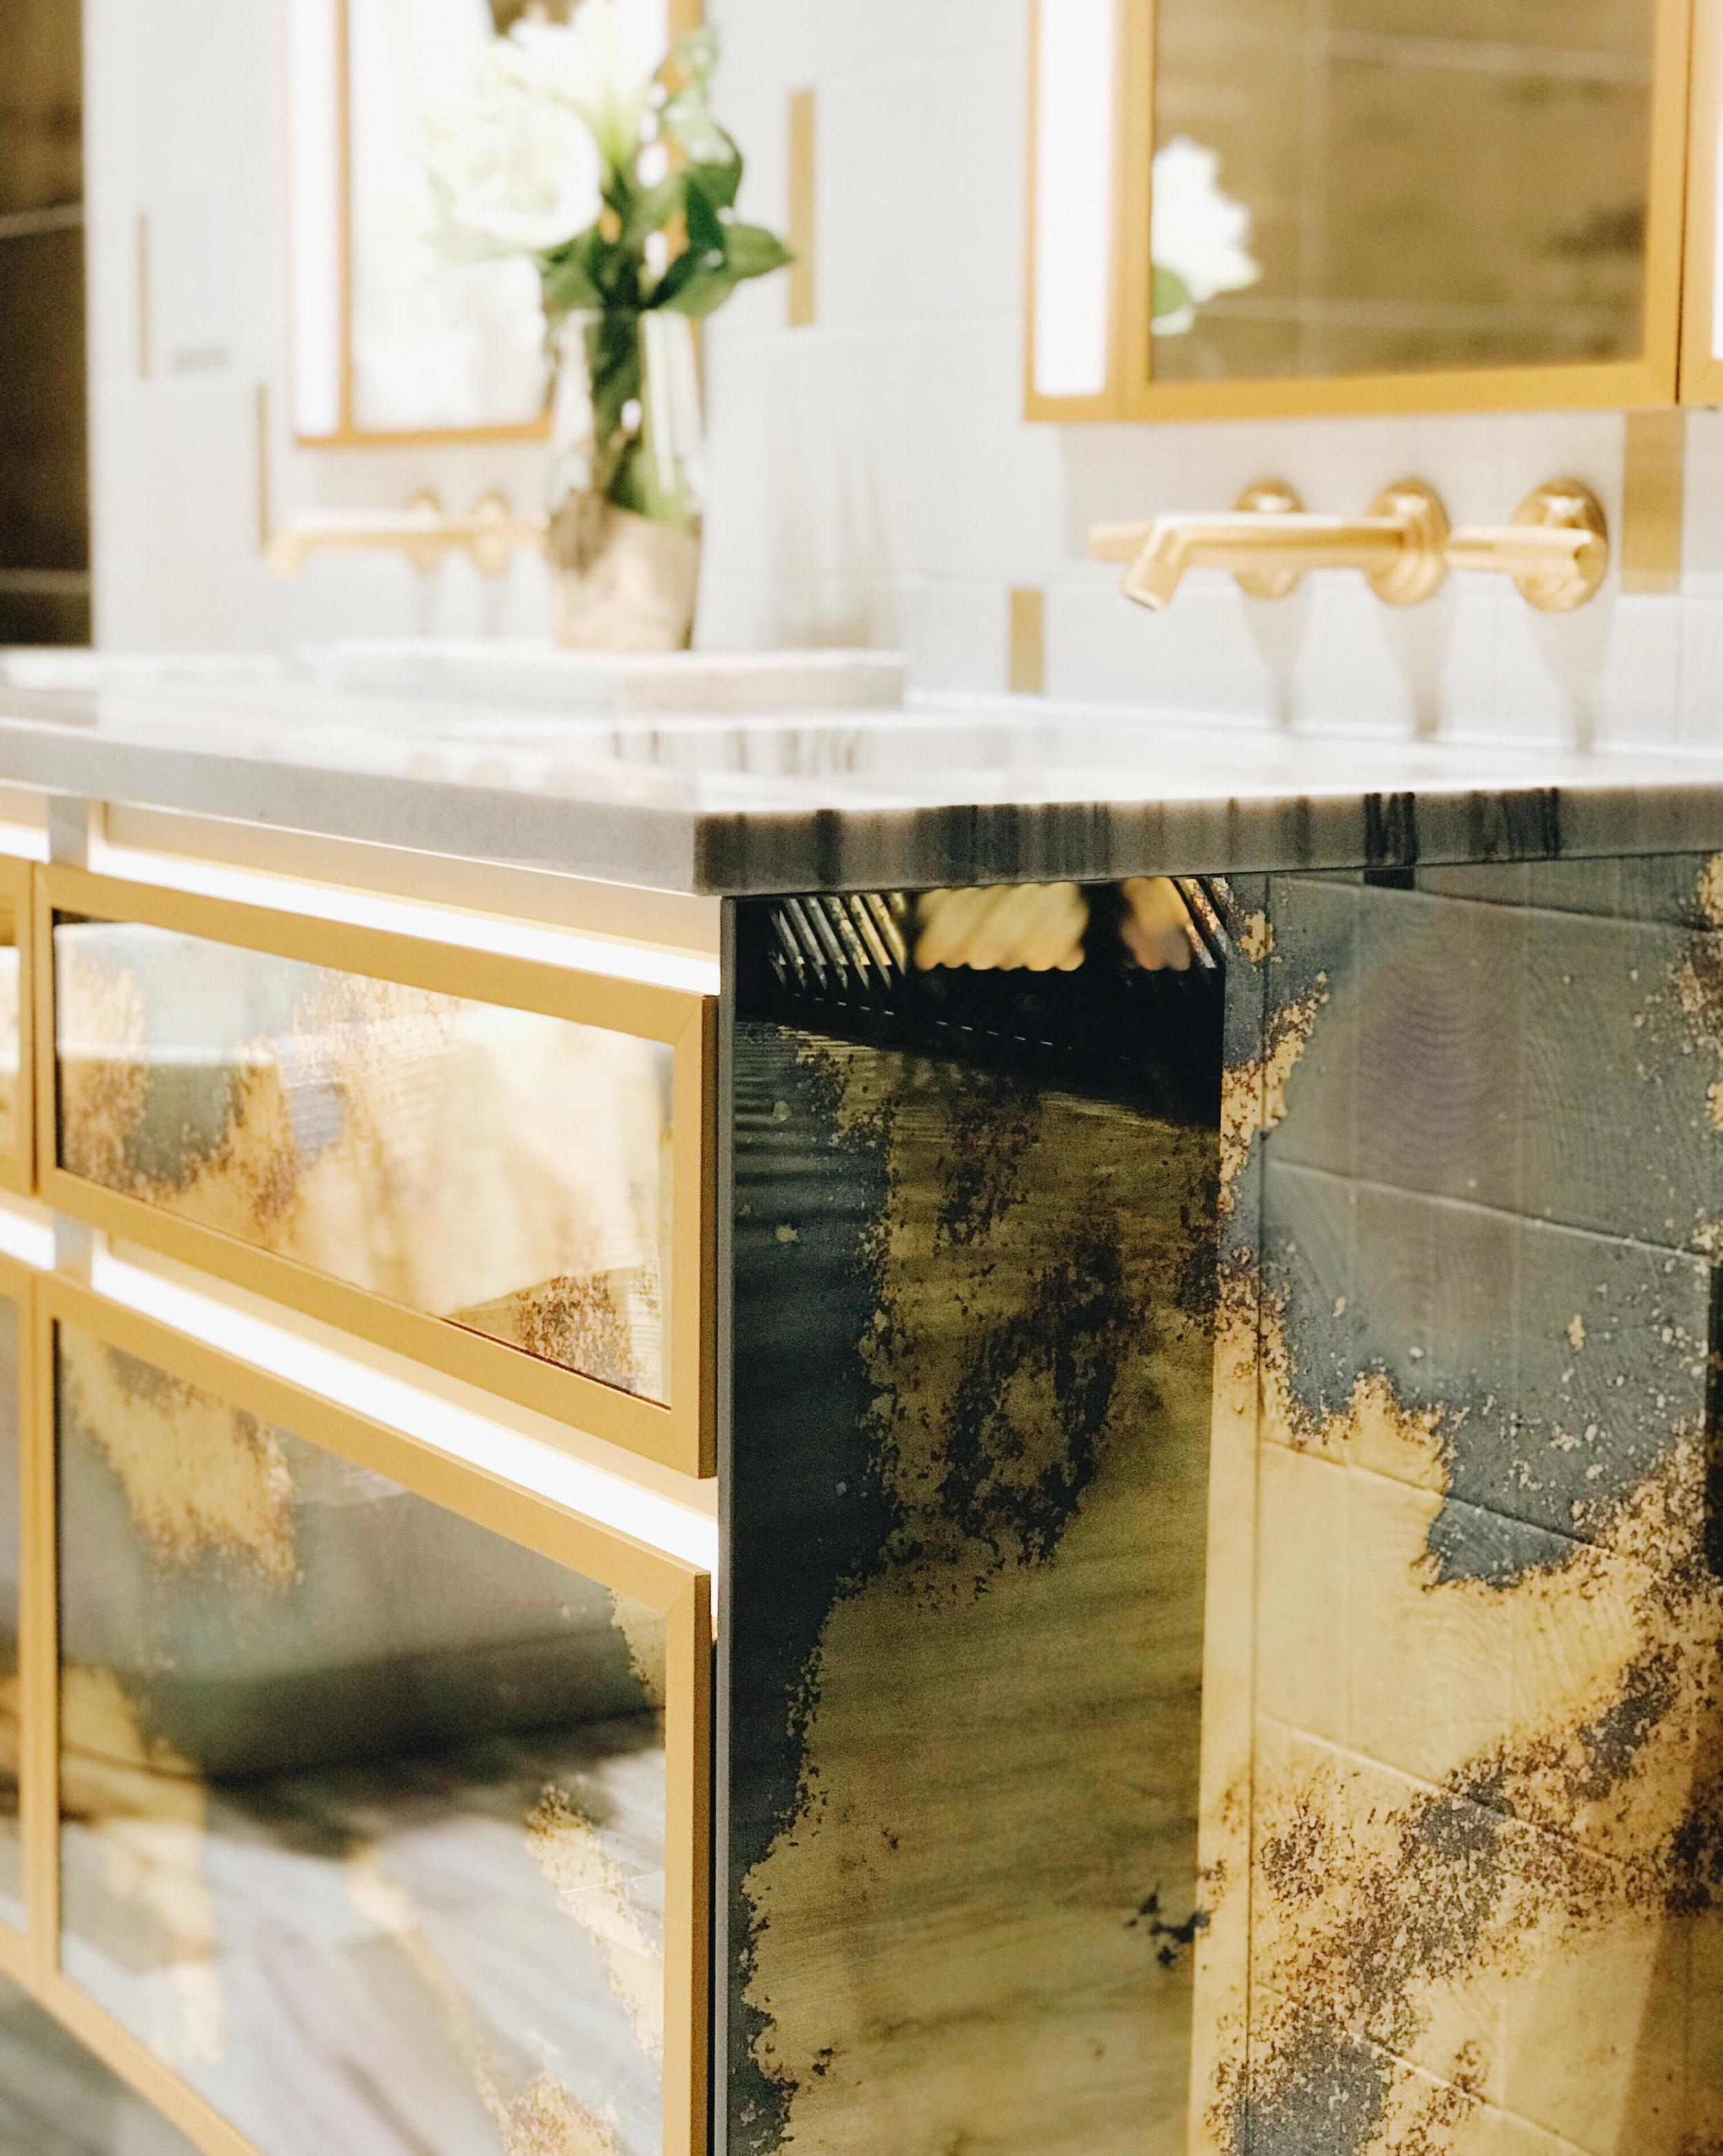 Robern Antique Mirrored Vanity, KBIS 2018, BlogTour, Nyla Free Designs, Calgary Interior Designer, #designhounds